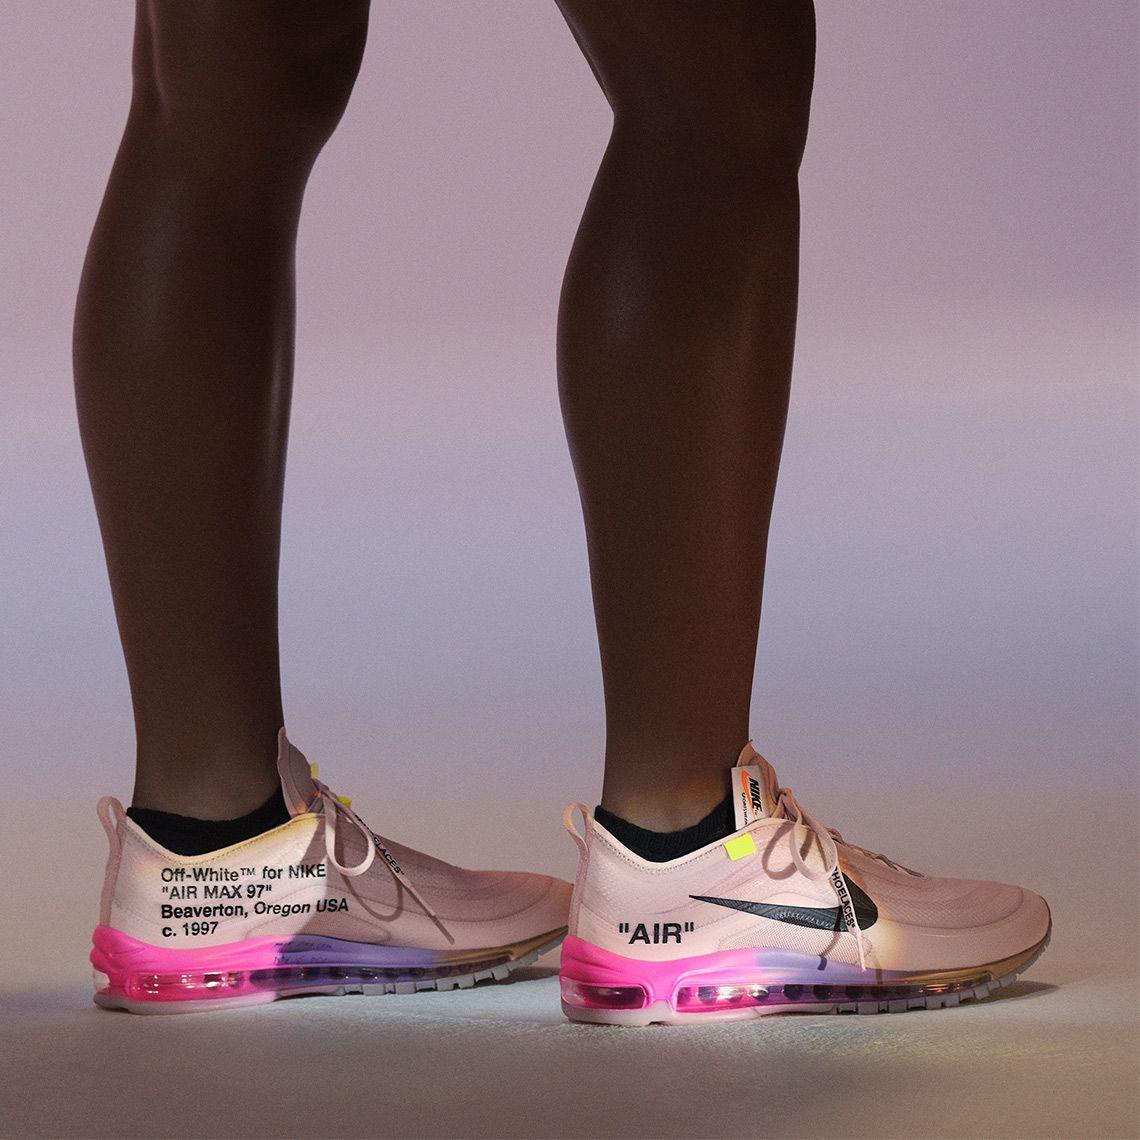 Off White Virgil Abloh Serena Williams Nike Air Max 97 Blazer Sneakernews Com Off White Shoes Nike Air Max 97 Off White Virgil Abloh